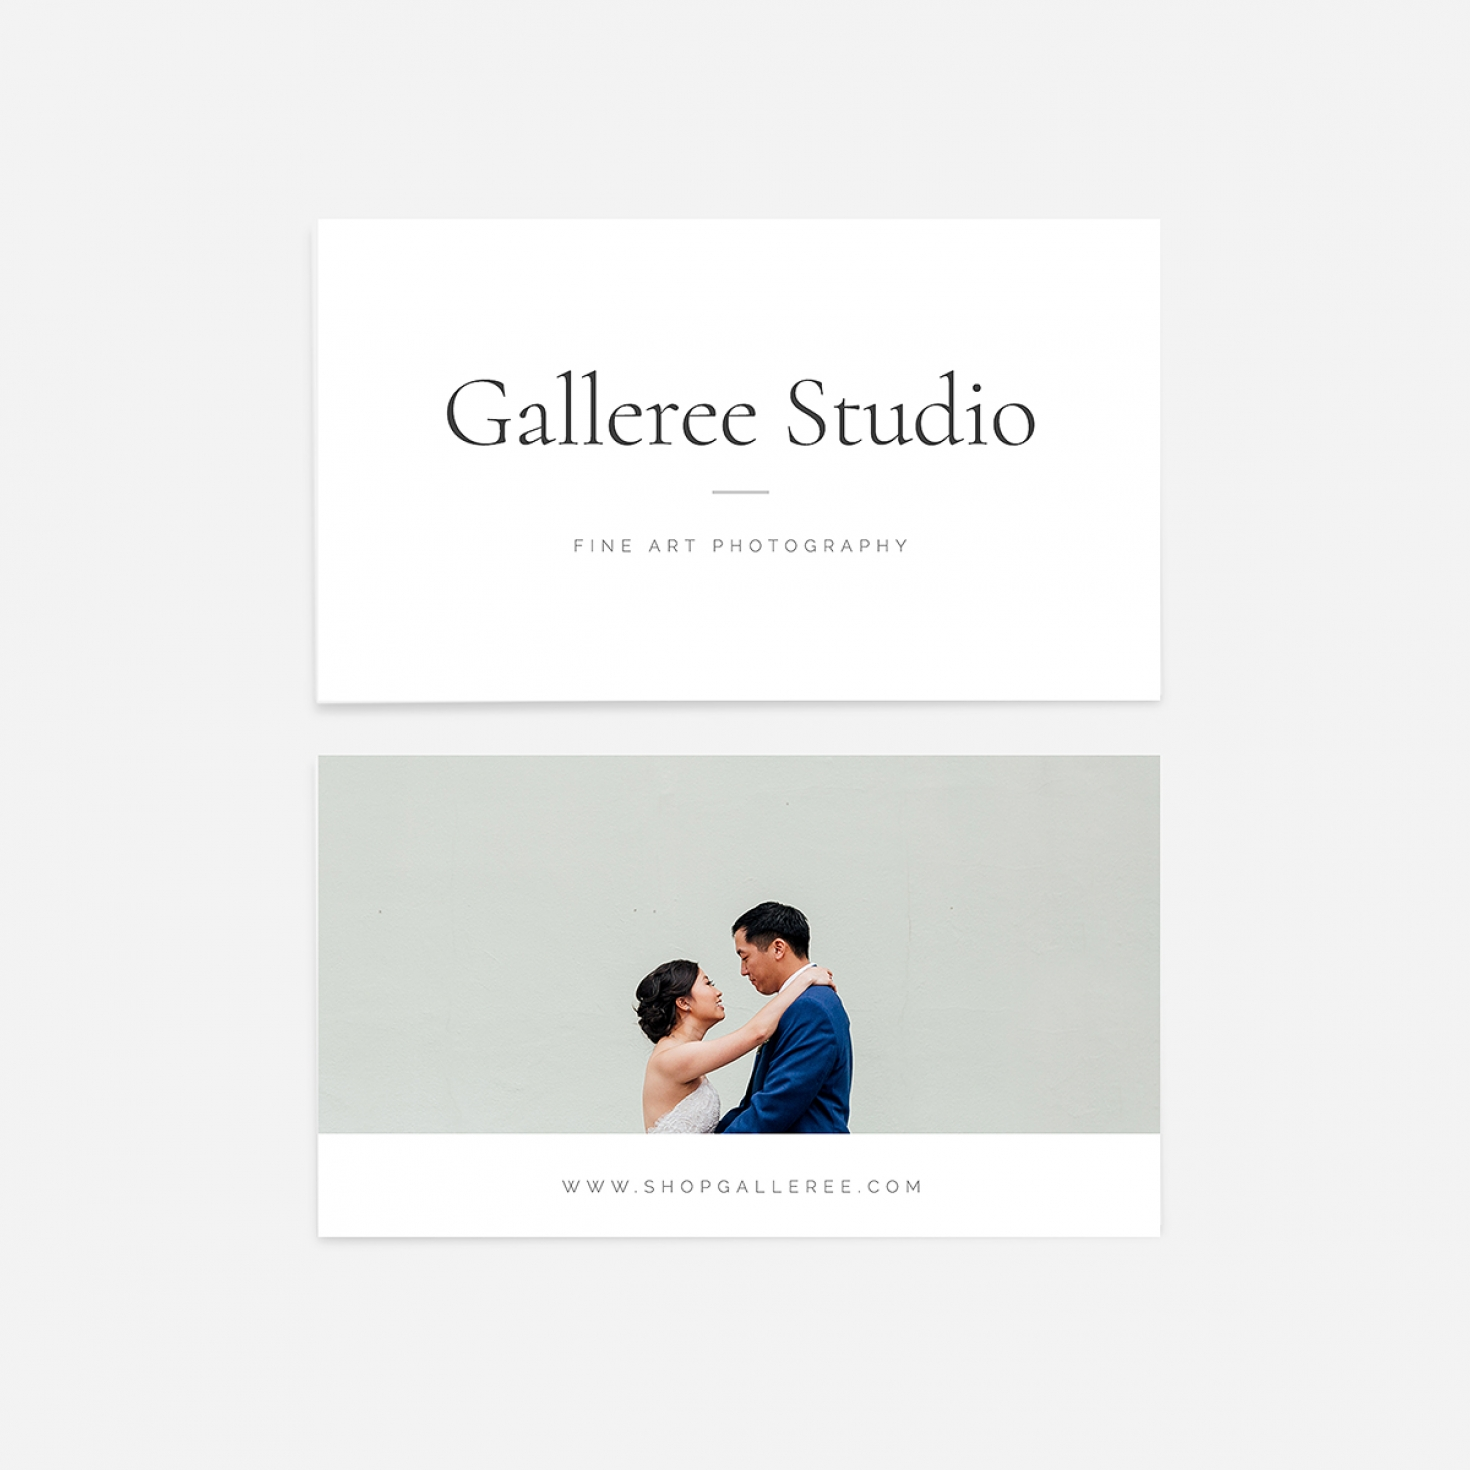 Photographer's Business Cards | Shopgalleree.com ...